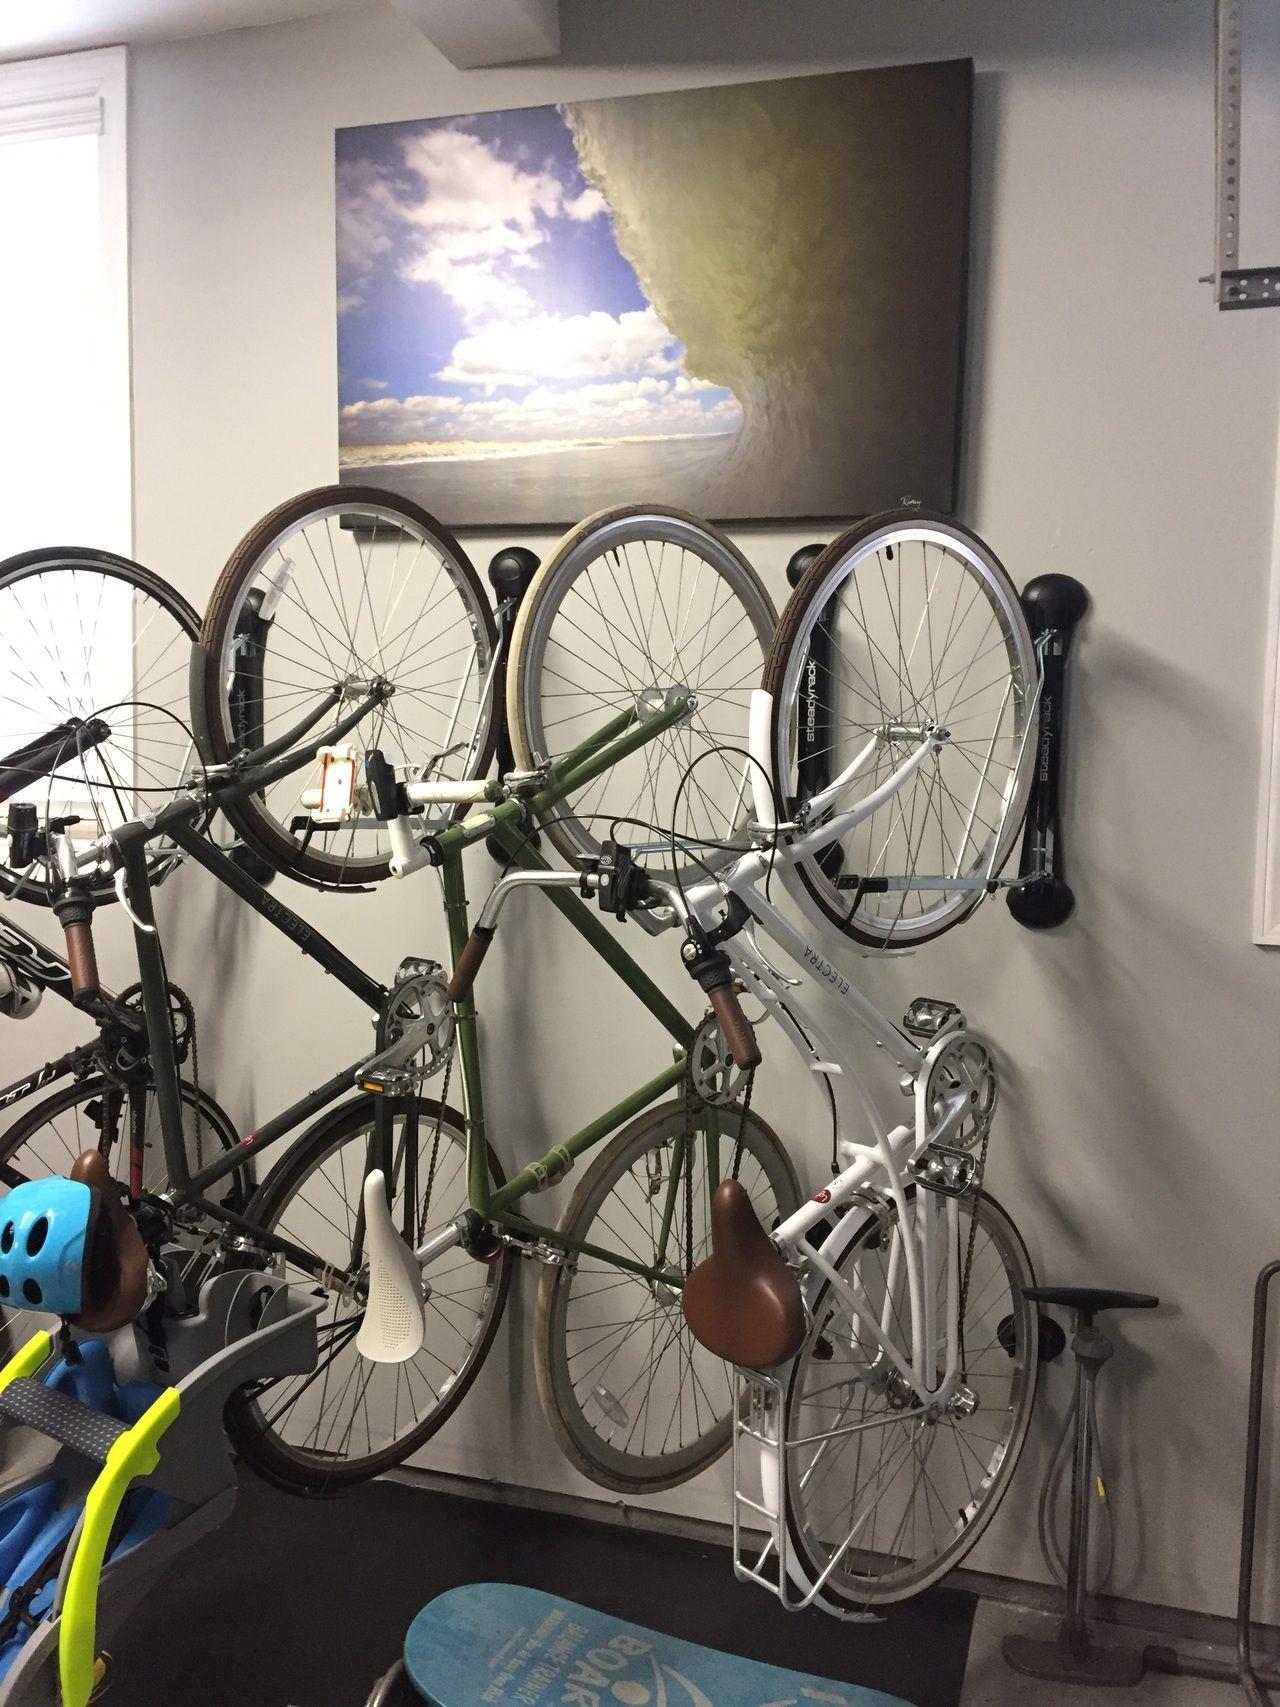 Compact Vertical Bike Rack - Wall Mount